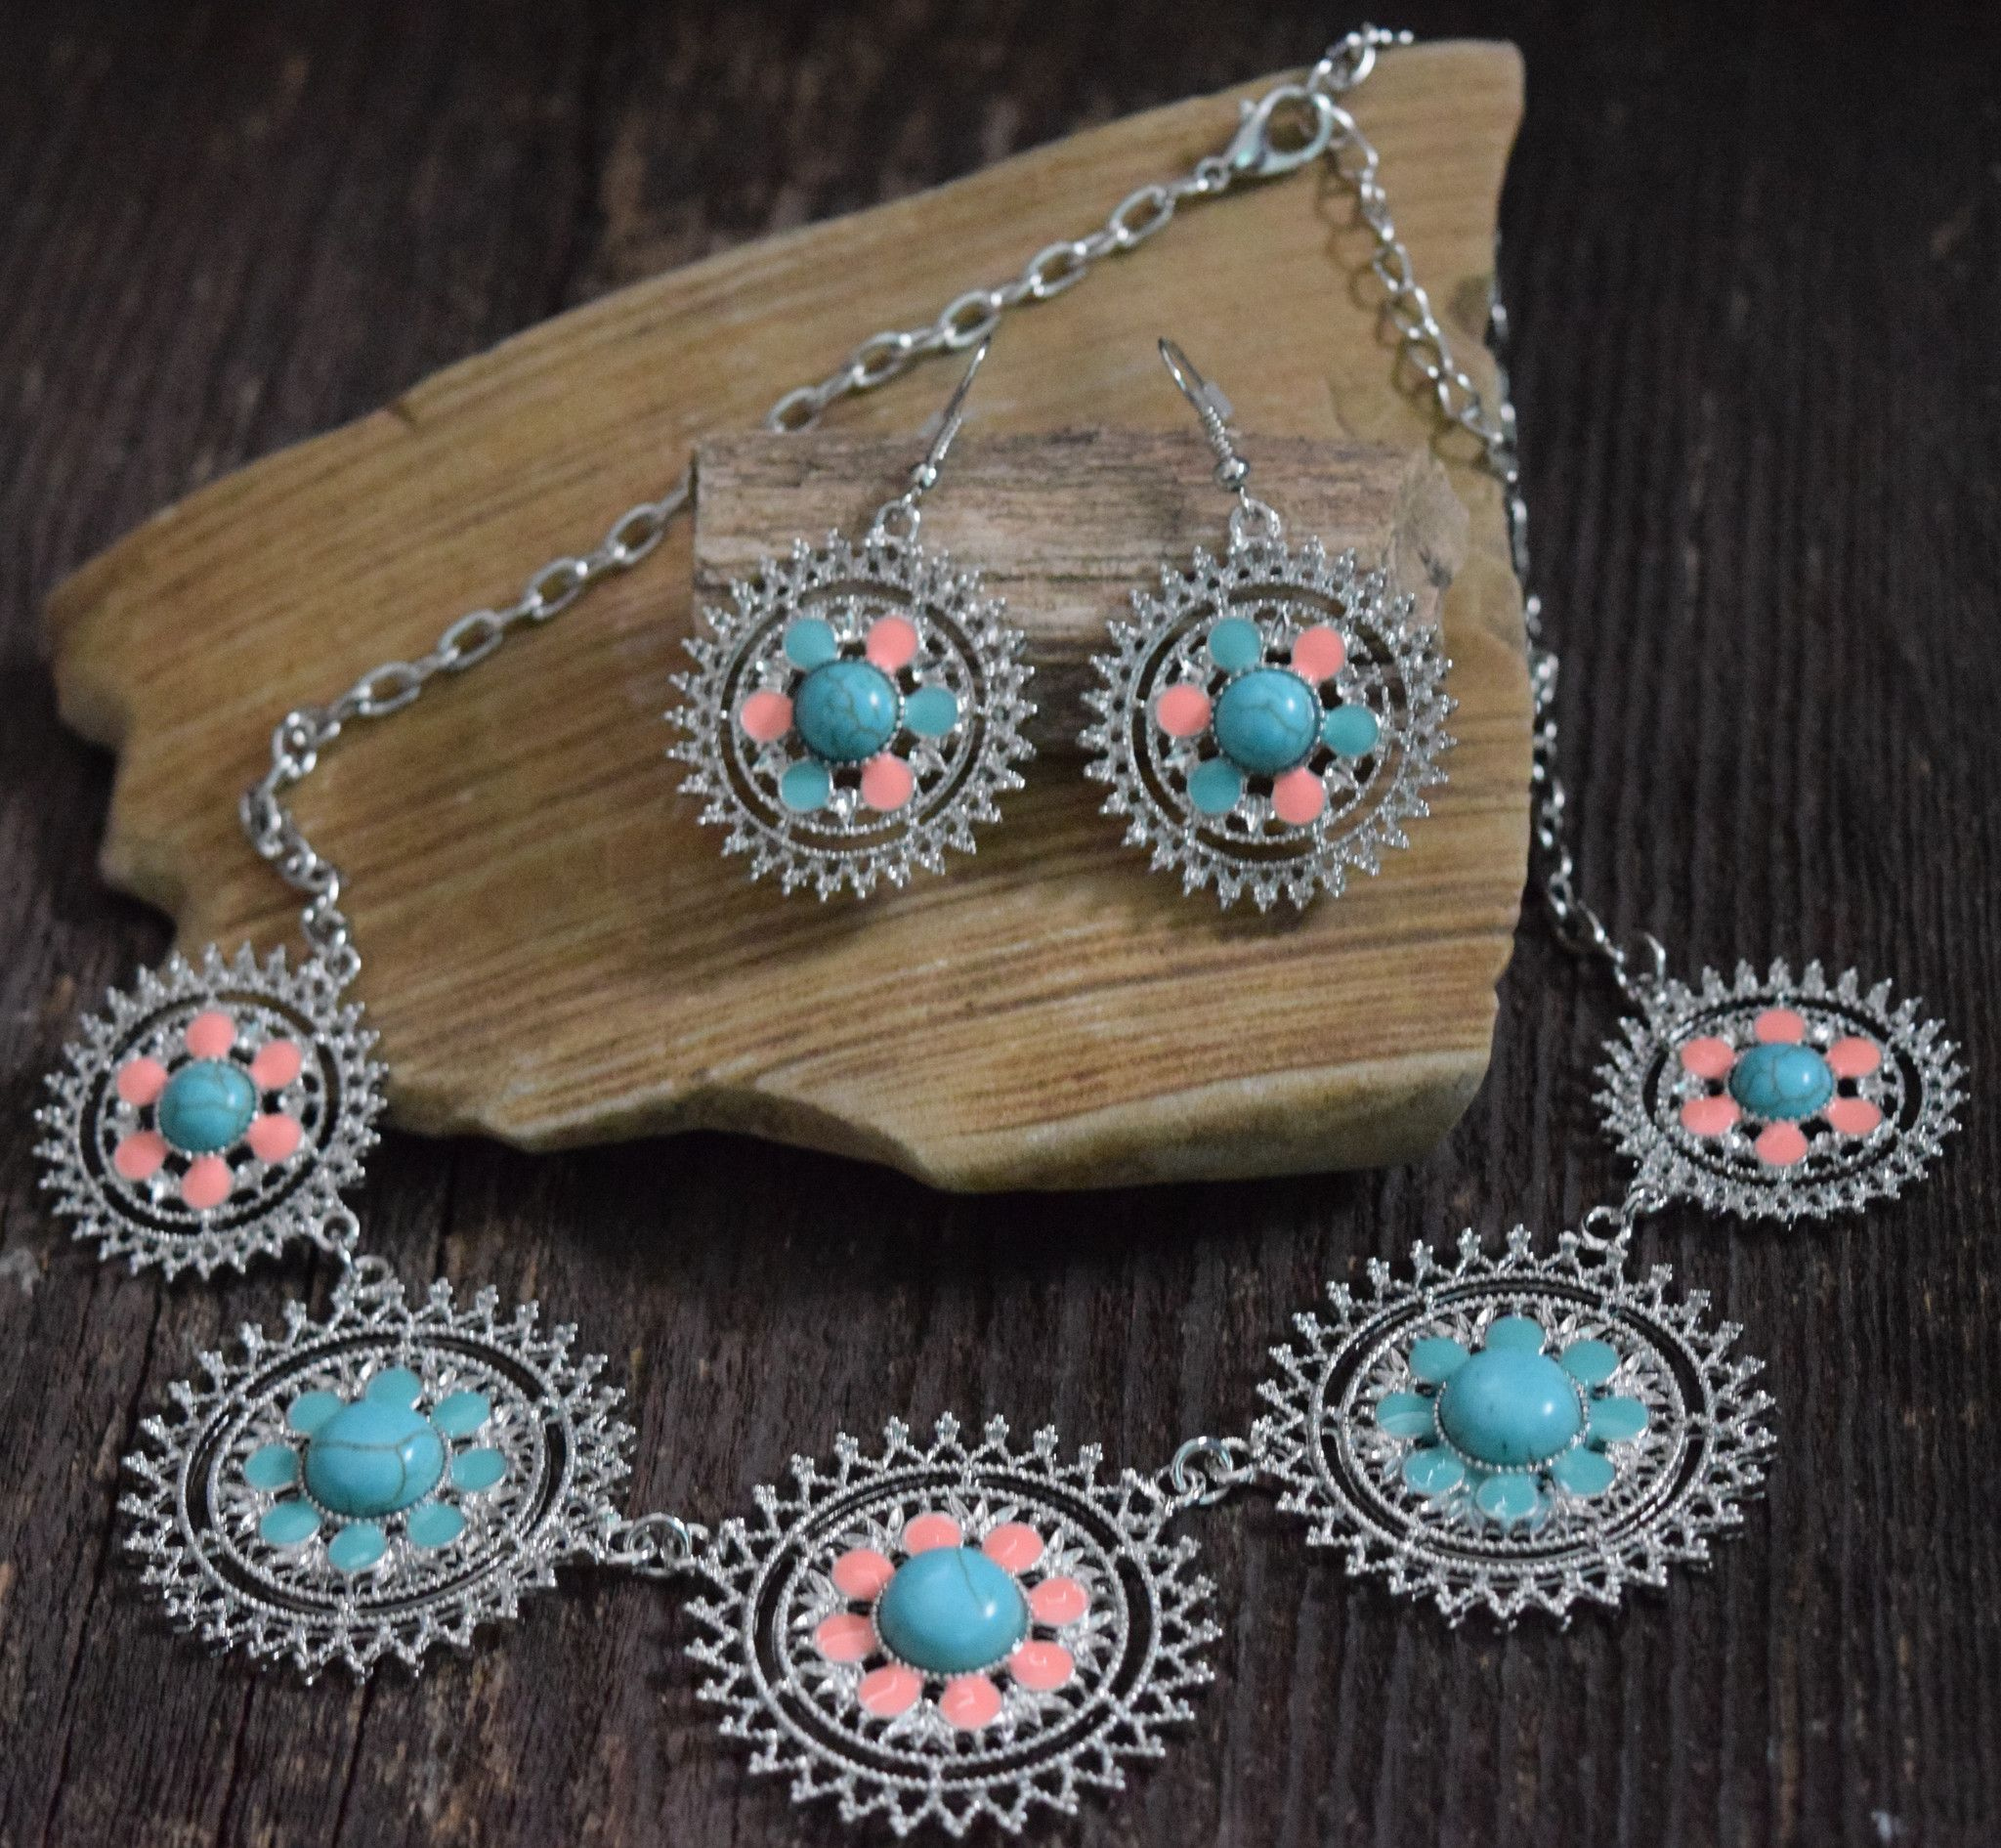 Vintage Turquoise Coral Necklace Set